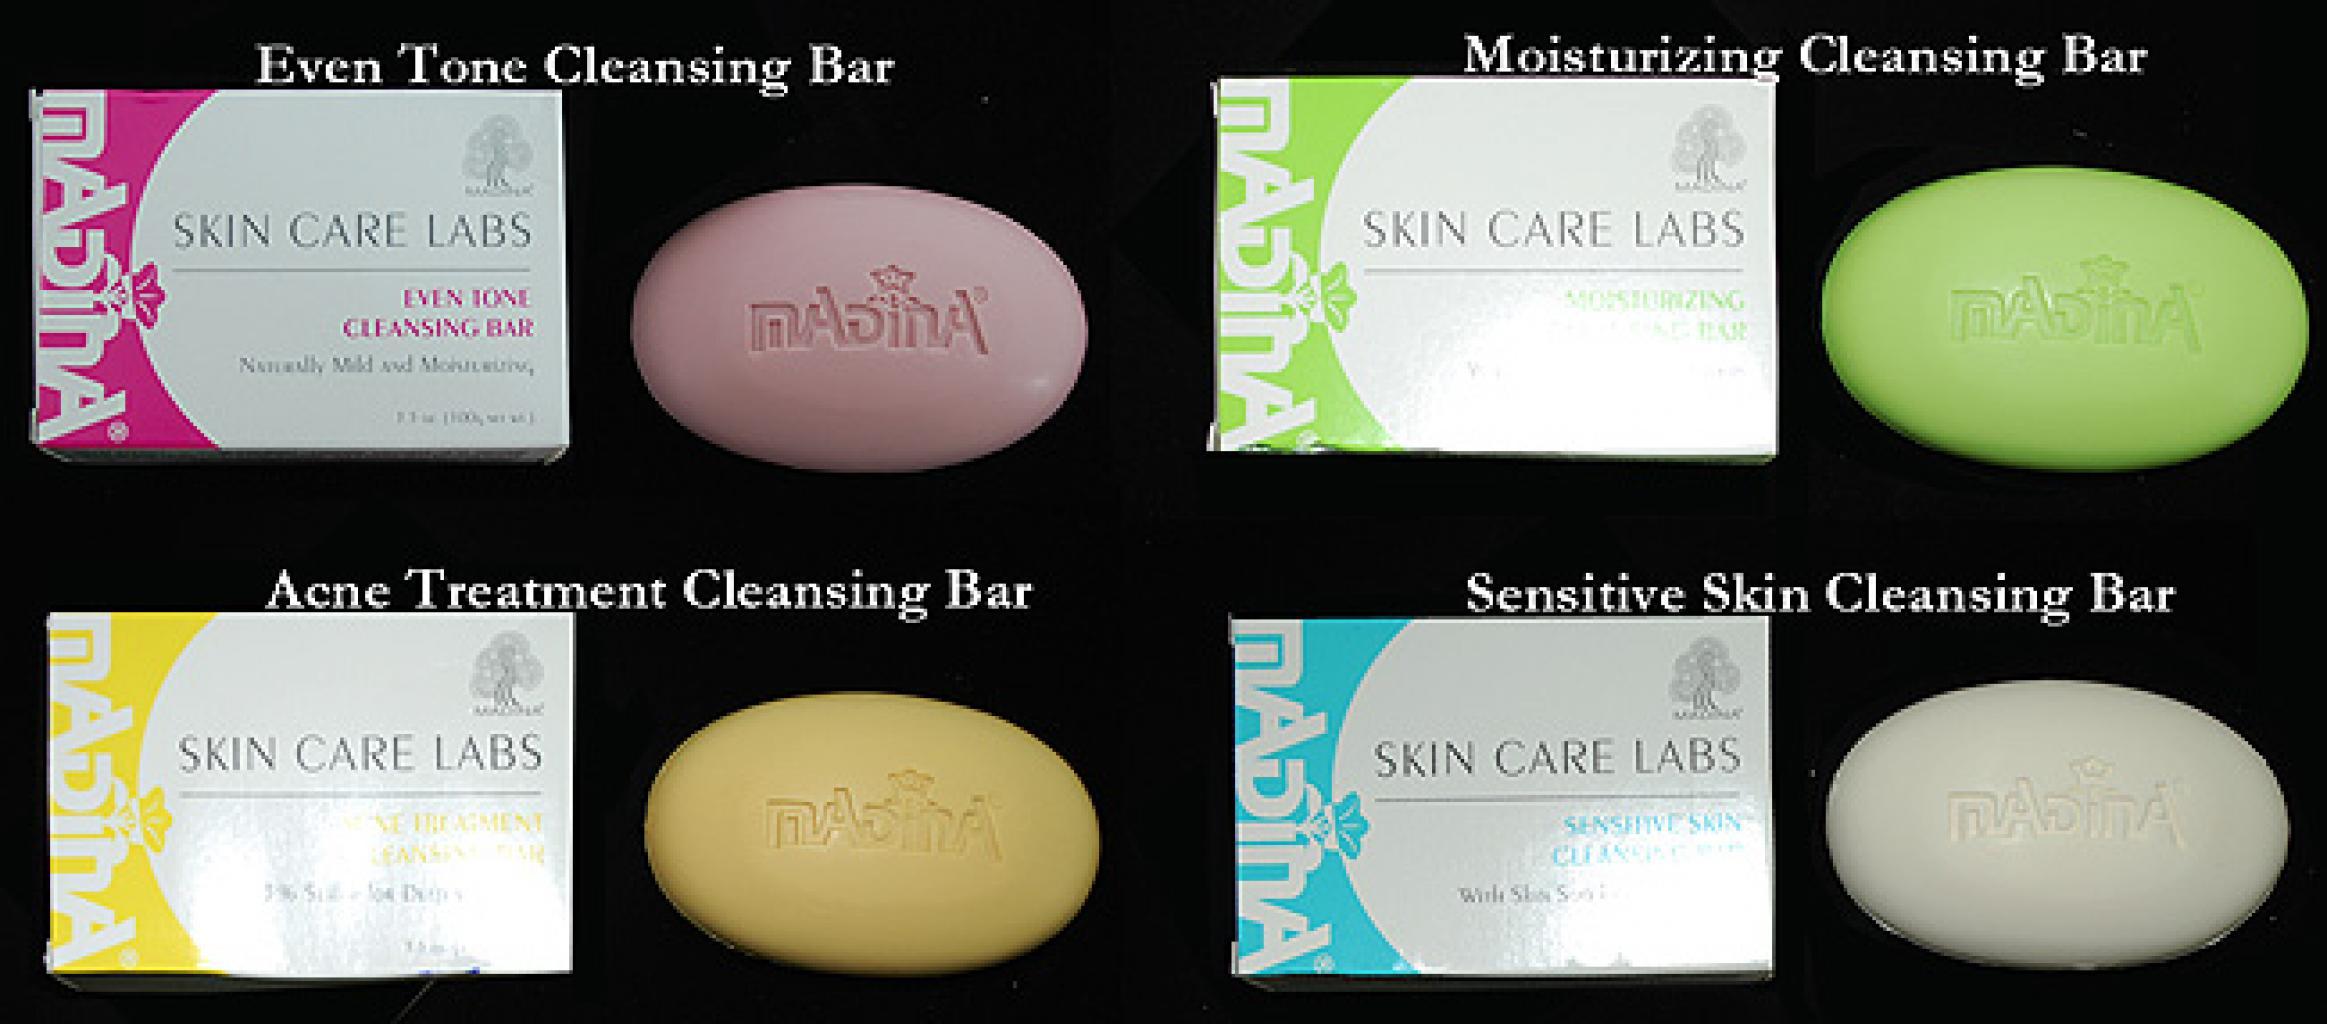 Madina Skin Care Labs Cleansing Bars gi690